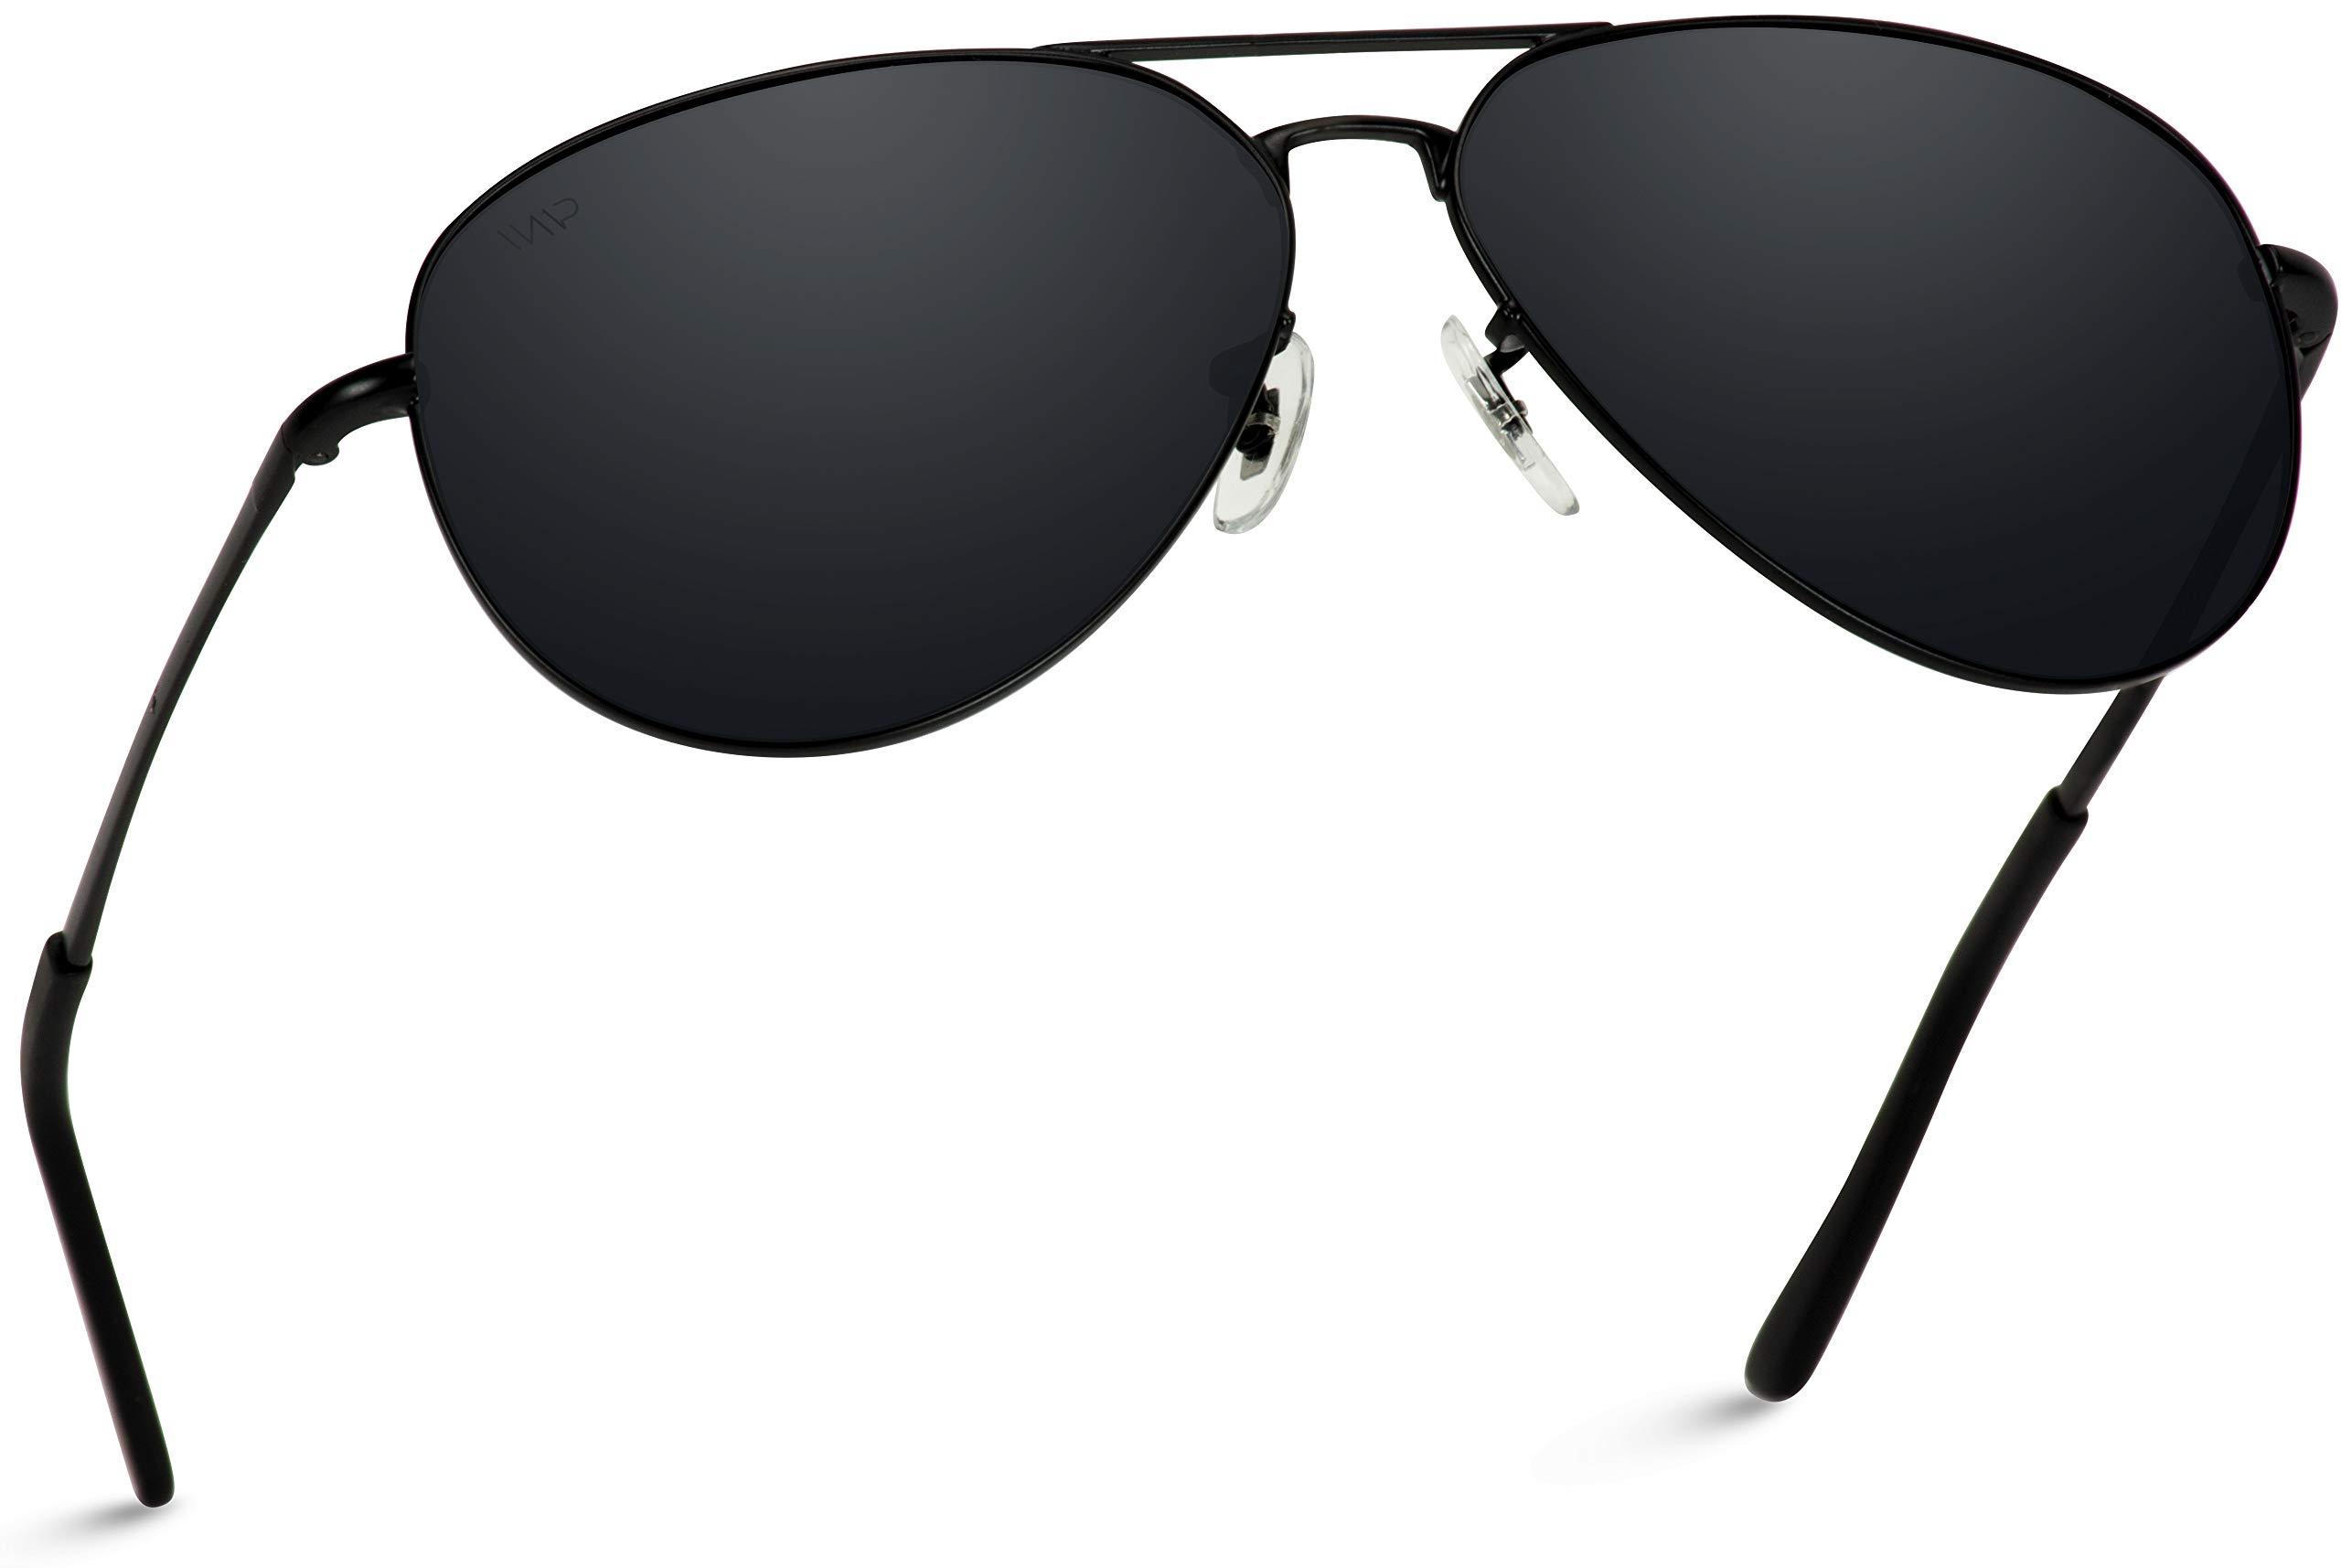 WearMe Pro - Classic Full Black Polarized Lens Metal Frame Men Aviator Style Sunglasses by WearMe Pro